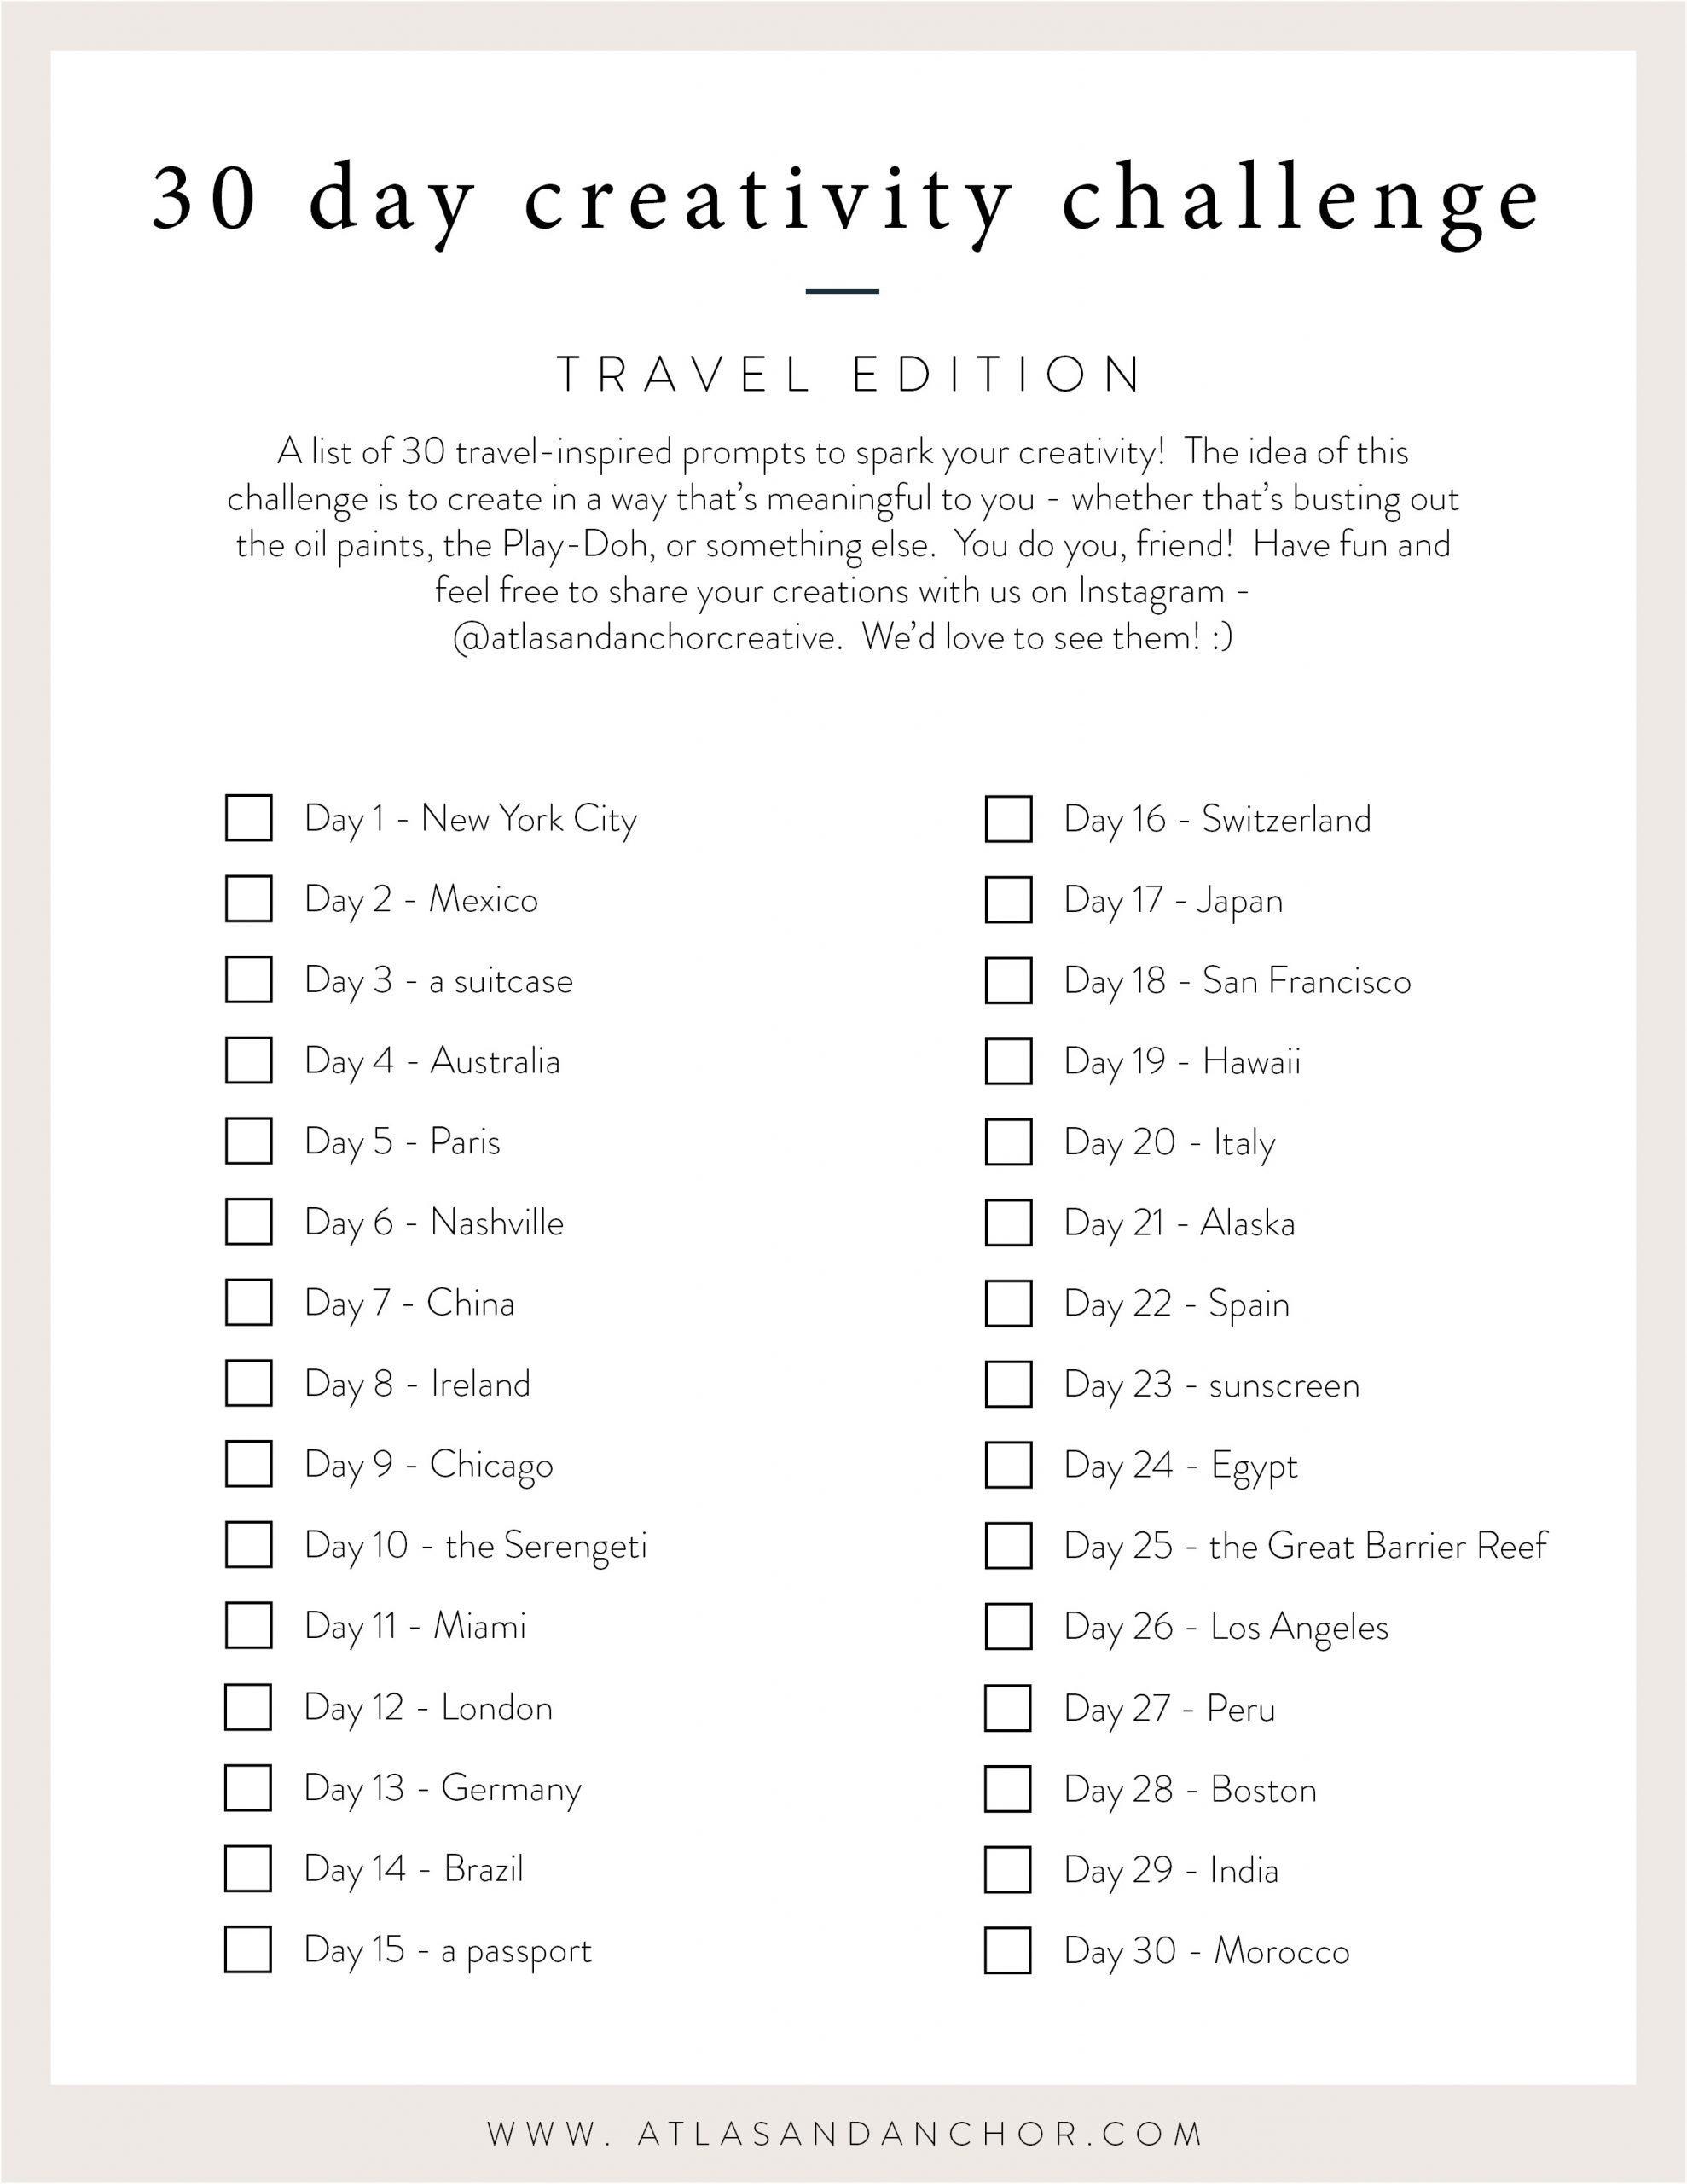 30 day creativity challenge